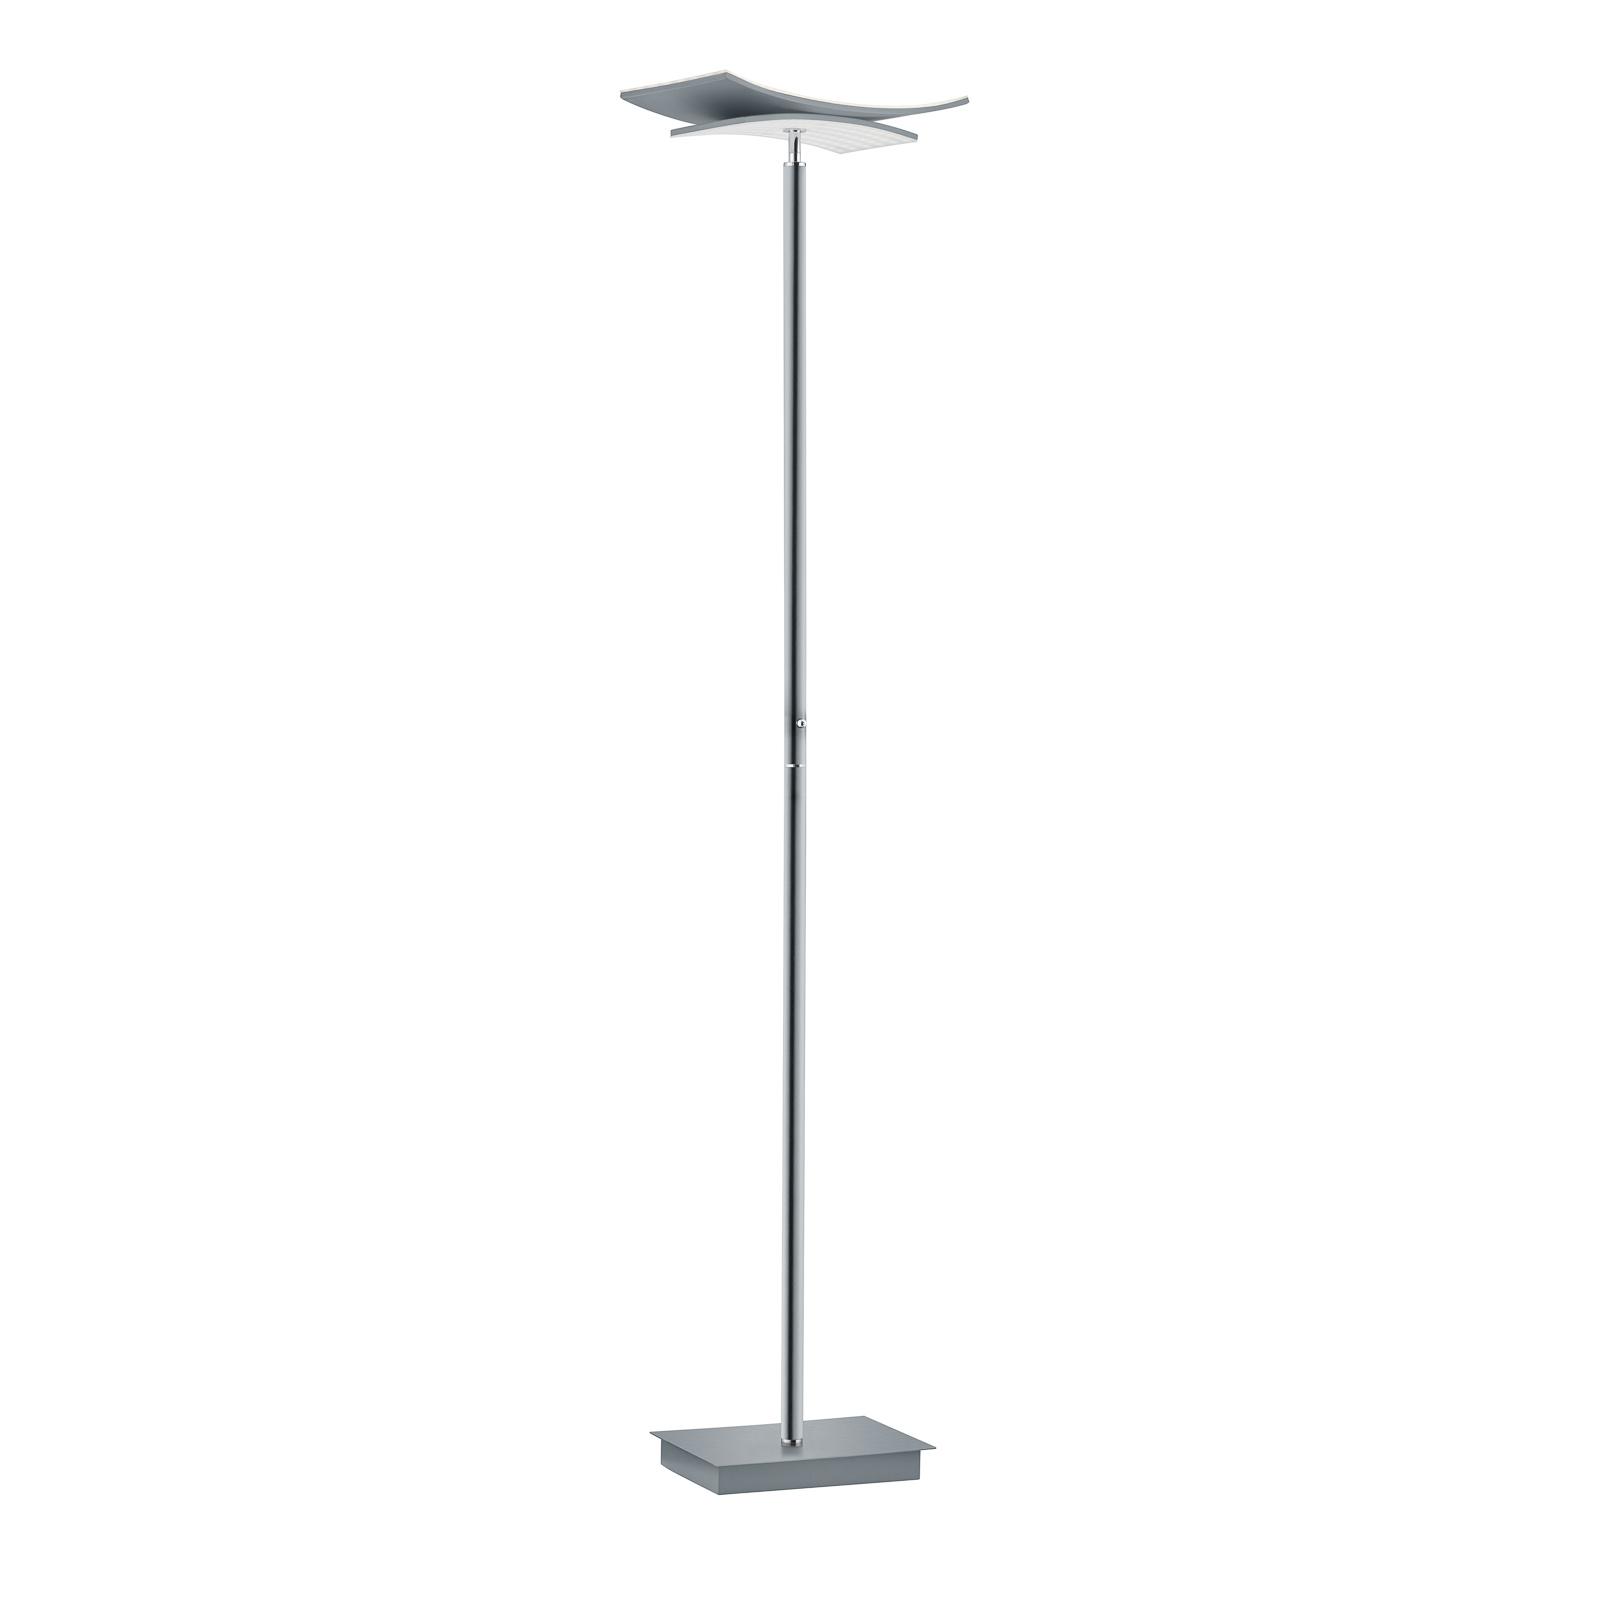 B-Leuchten Liberty lampadaire LED, nickel mat